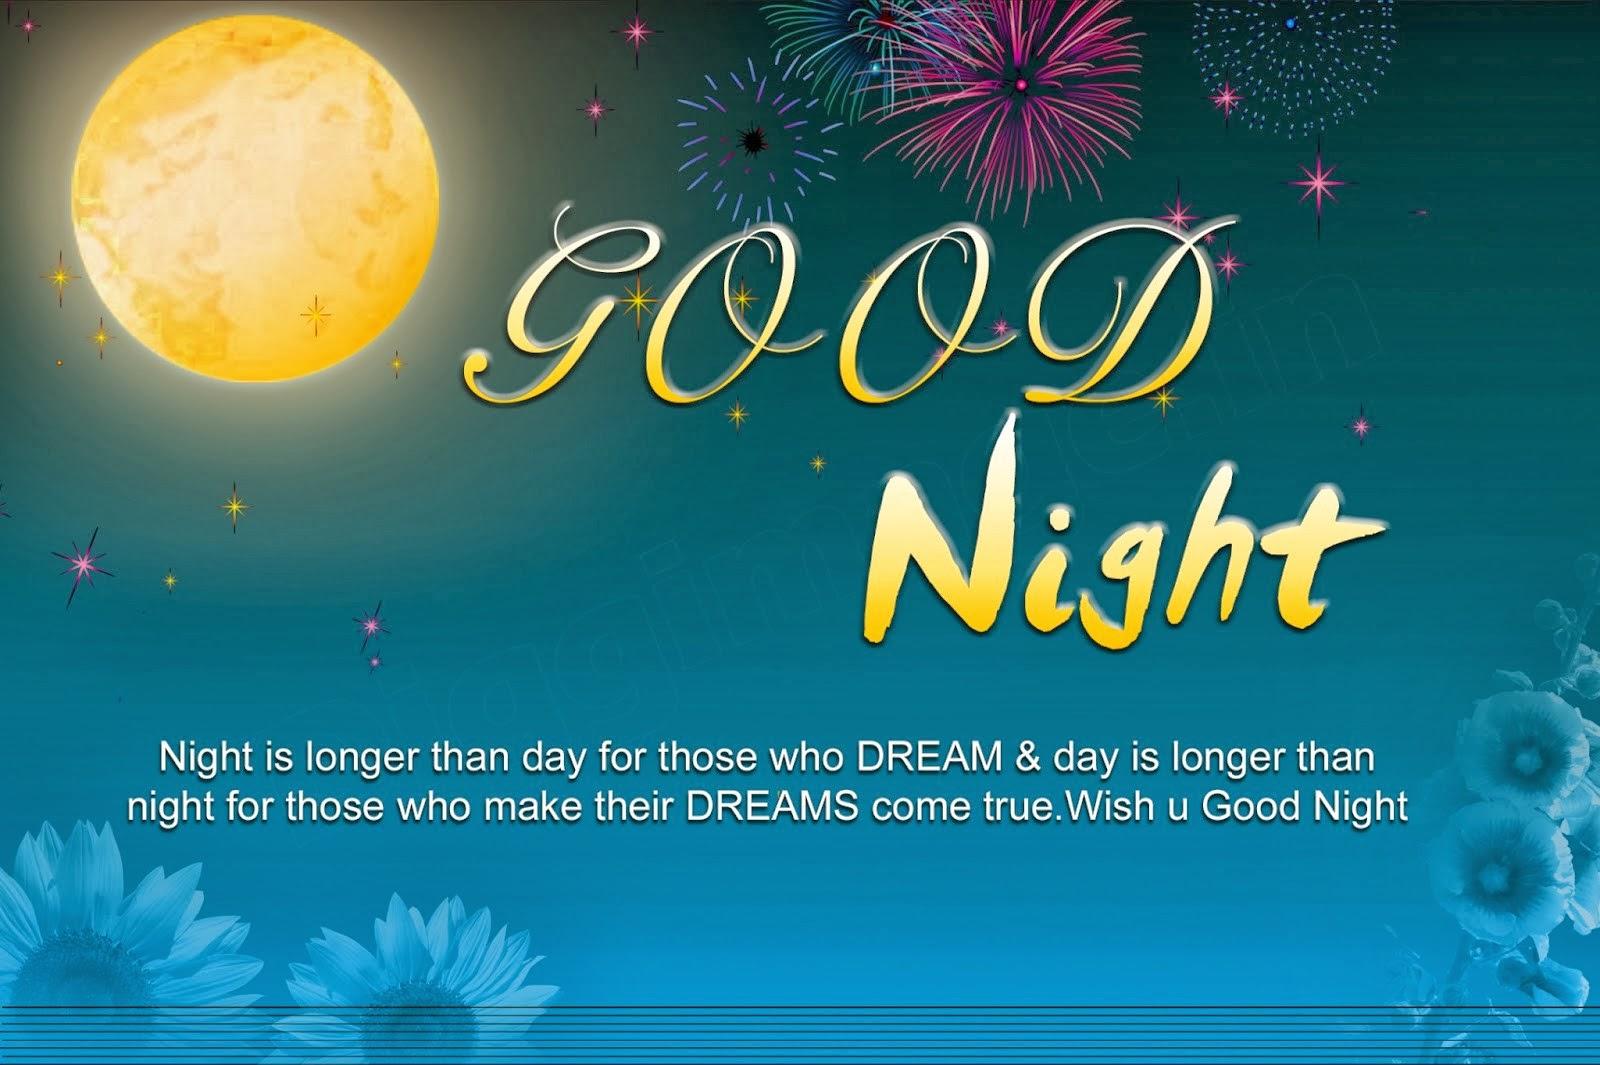 Wallpaper download good night -  Good Night Quote Wallpaper